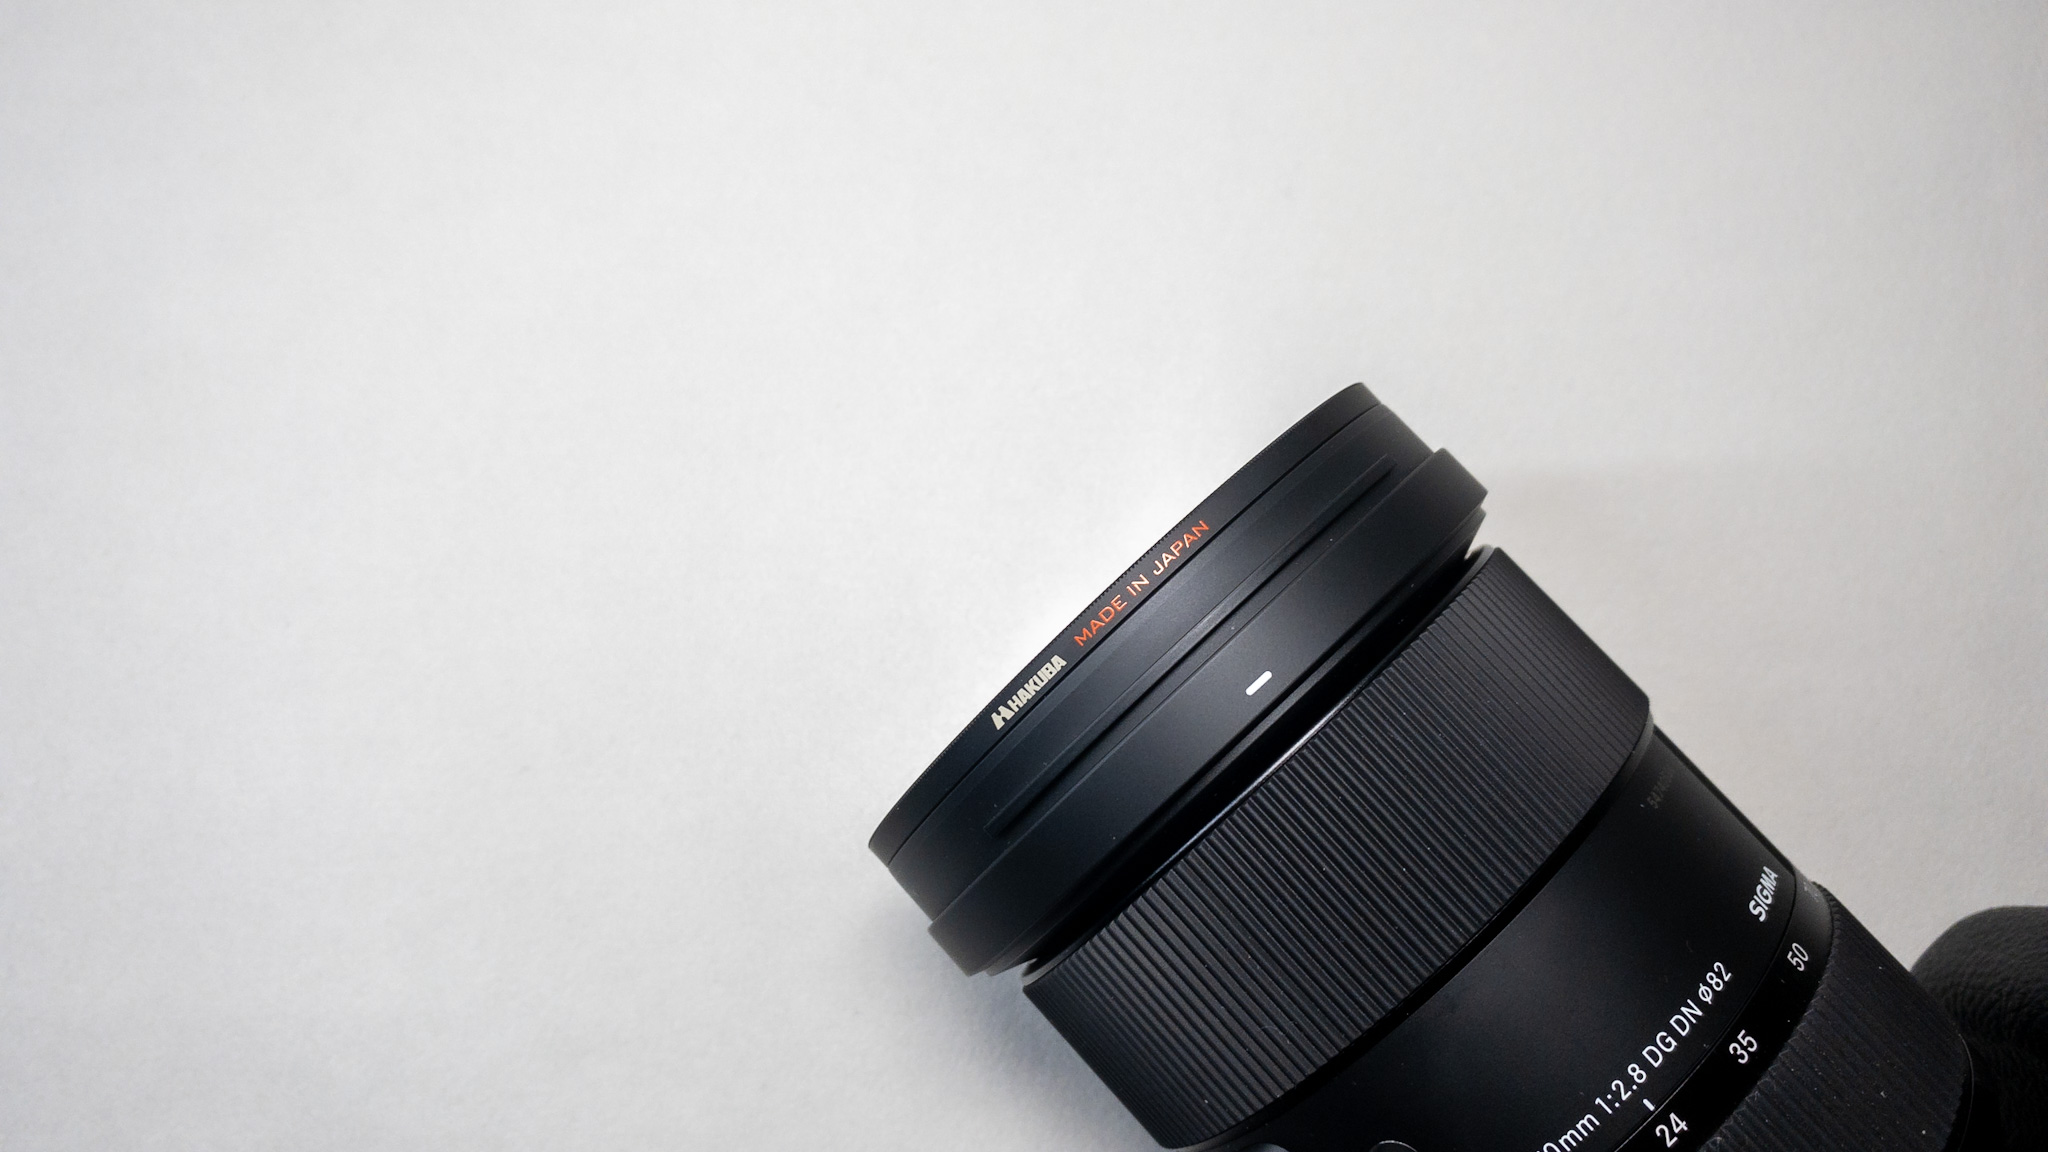 MoNomad運営者のカメラ機材|HAKUBAのレンズフィルター